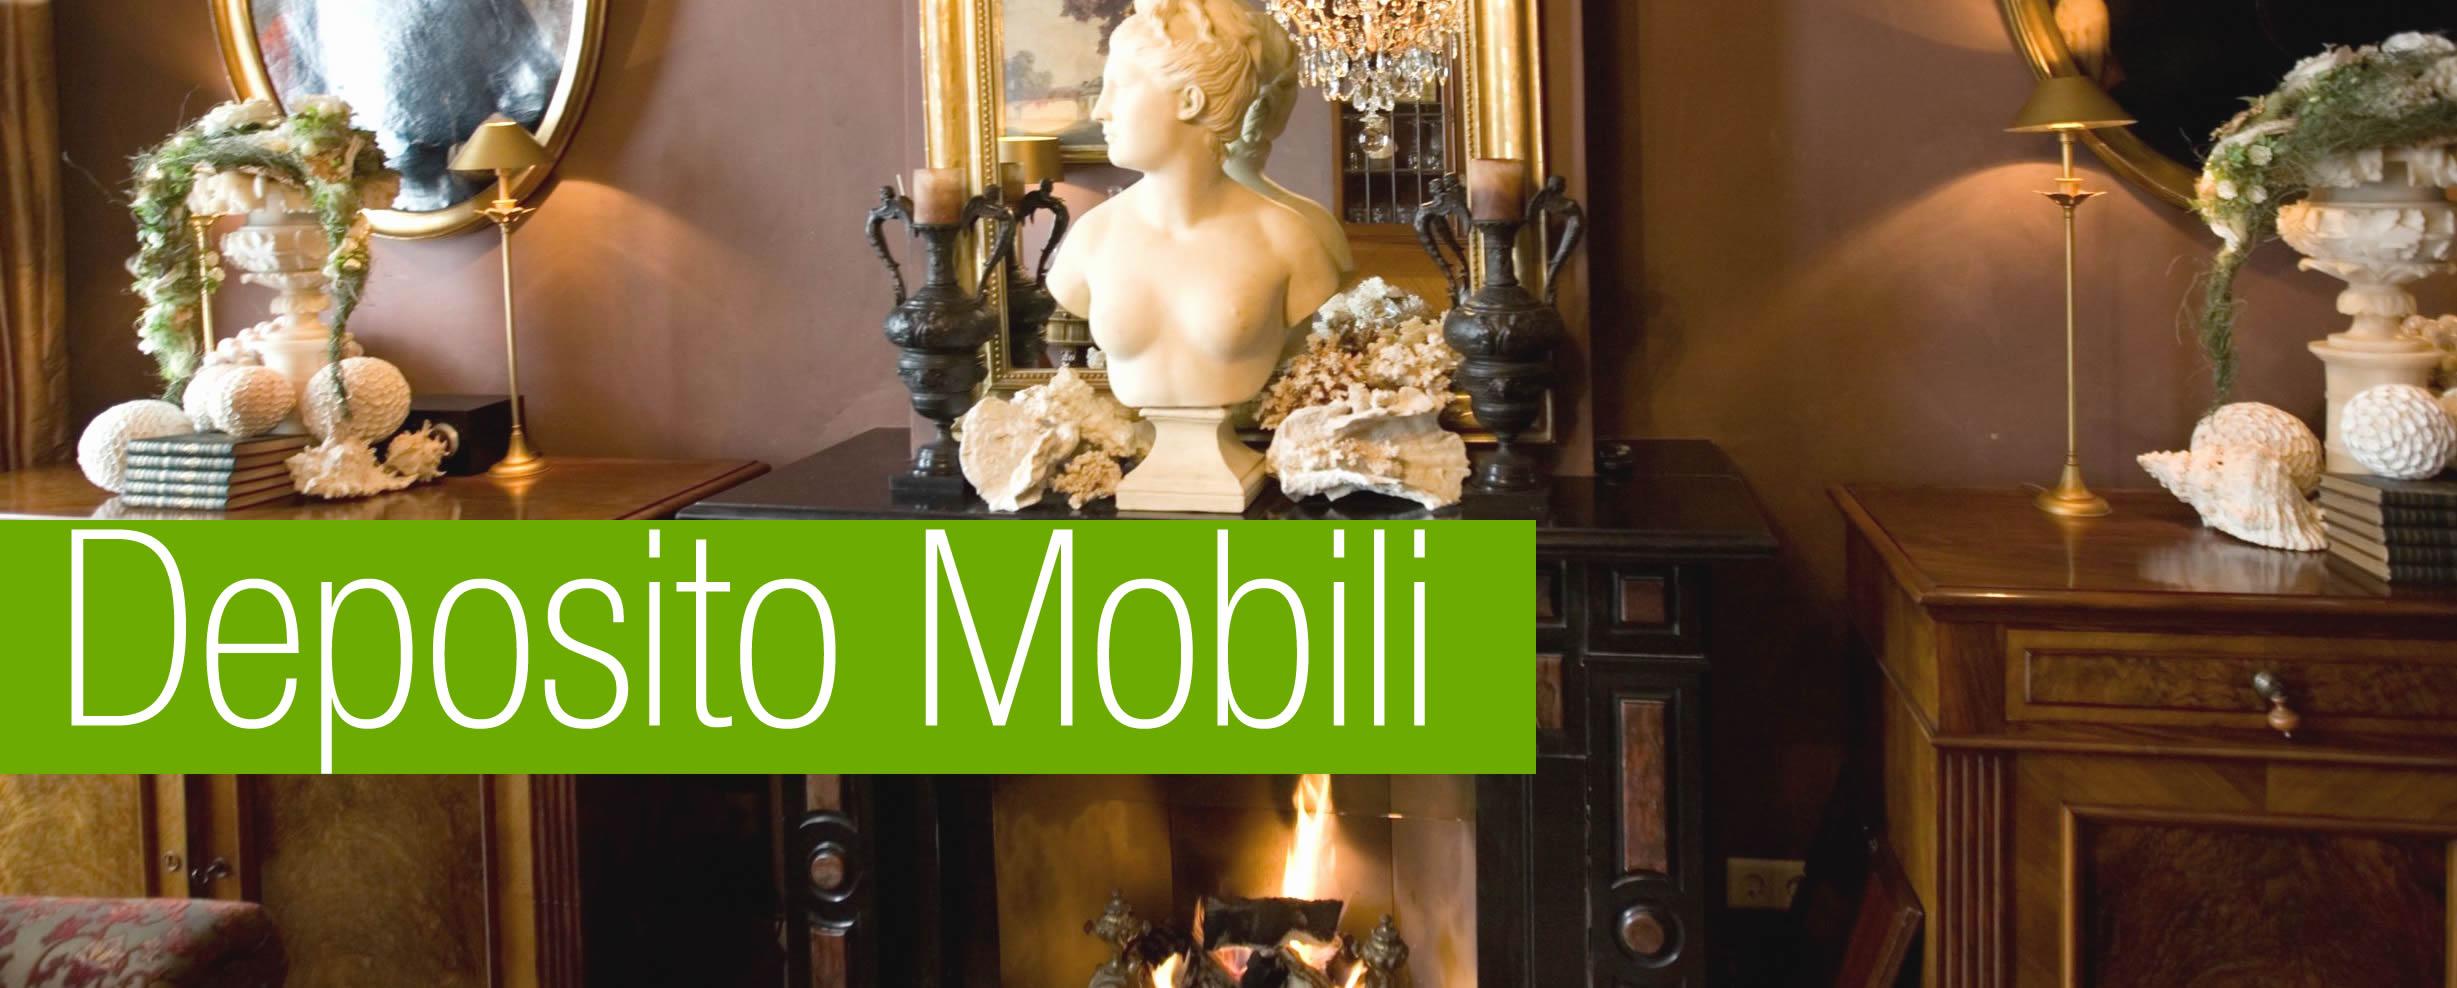 Eur Montagnola - Imballaggi per Trasloco - Deposito Mobili a Eur Montagnola